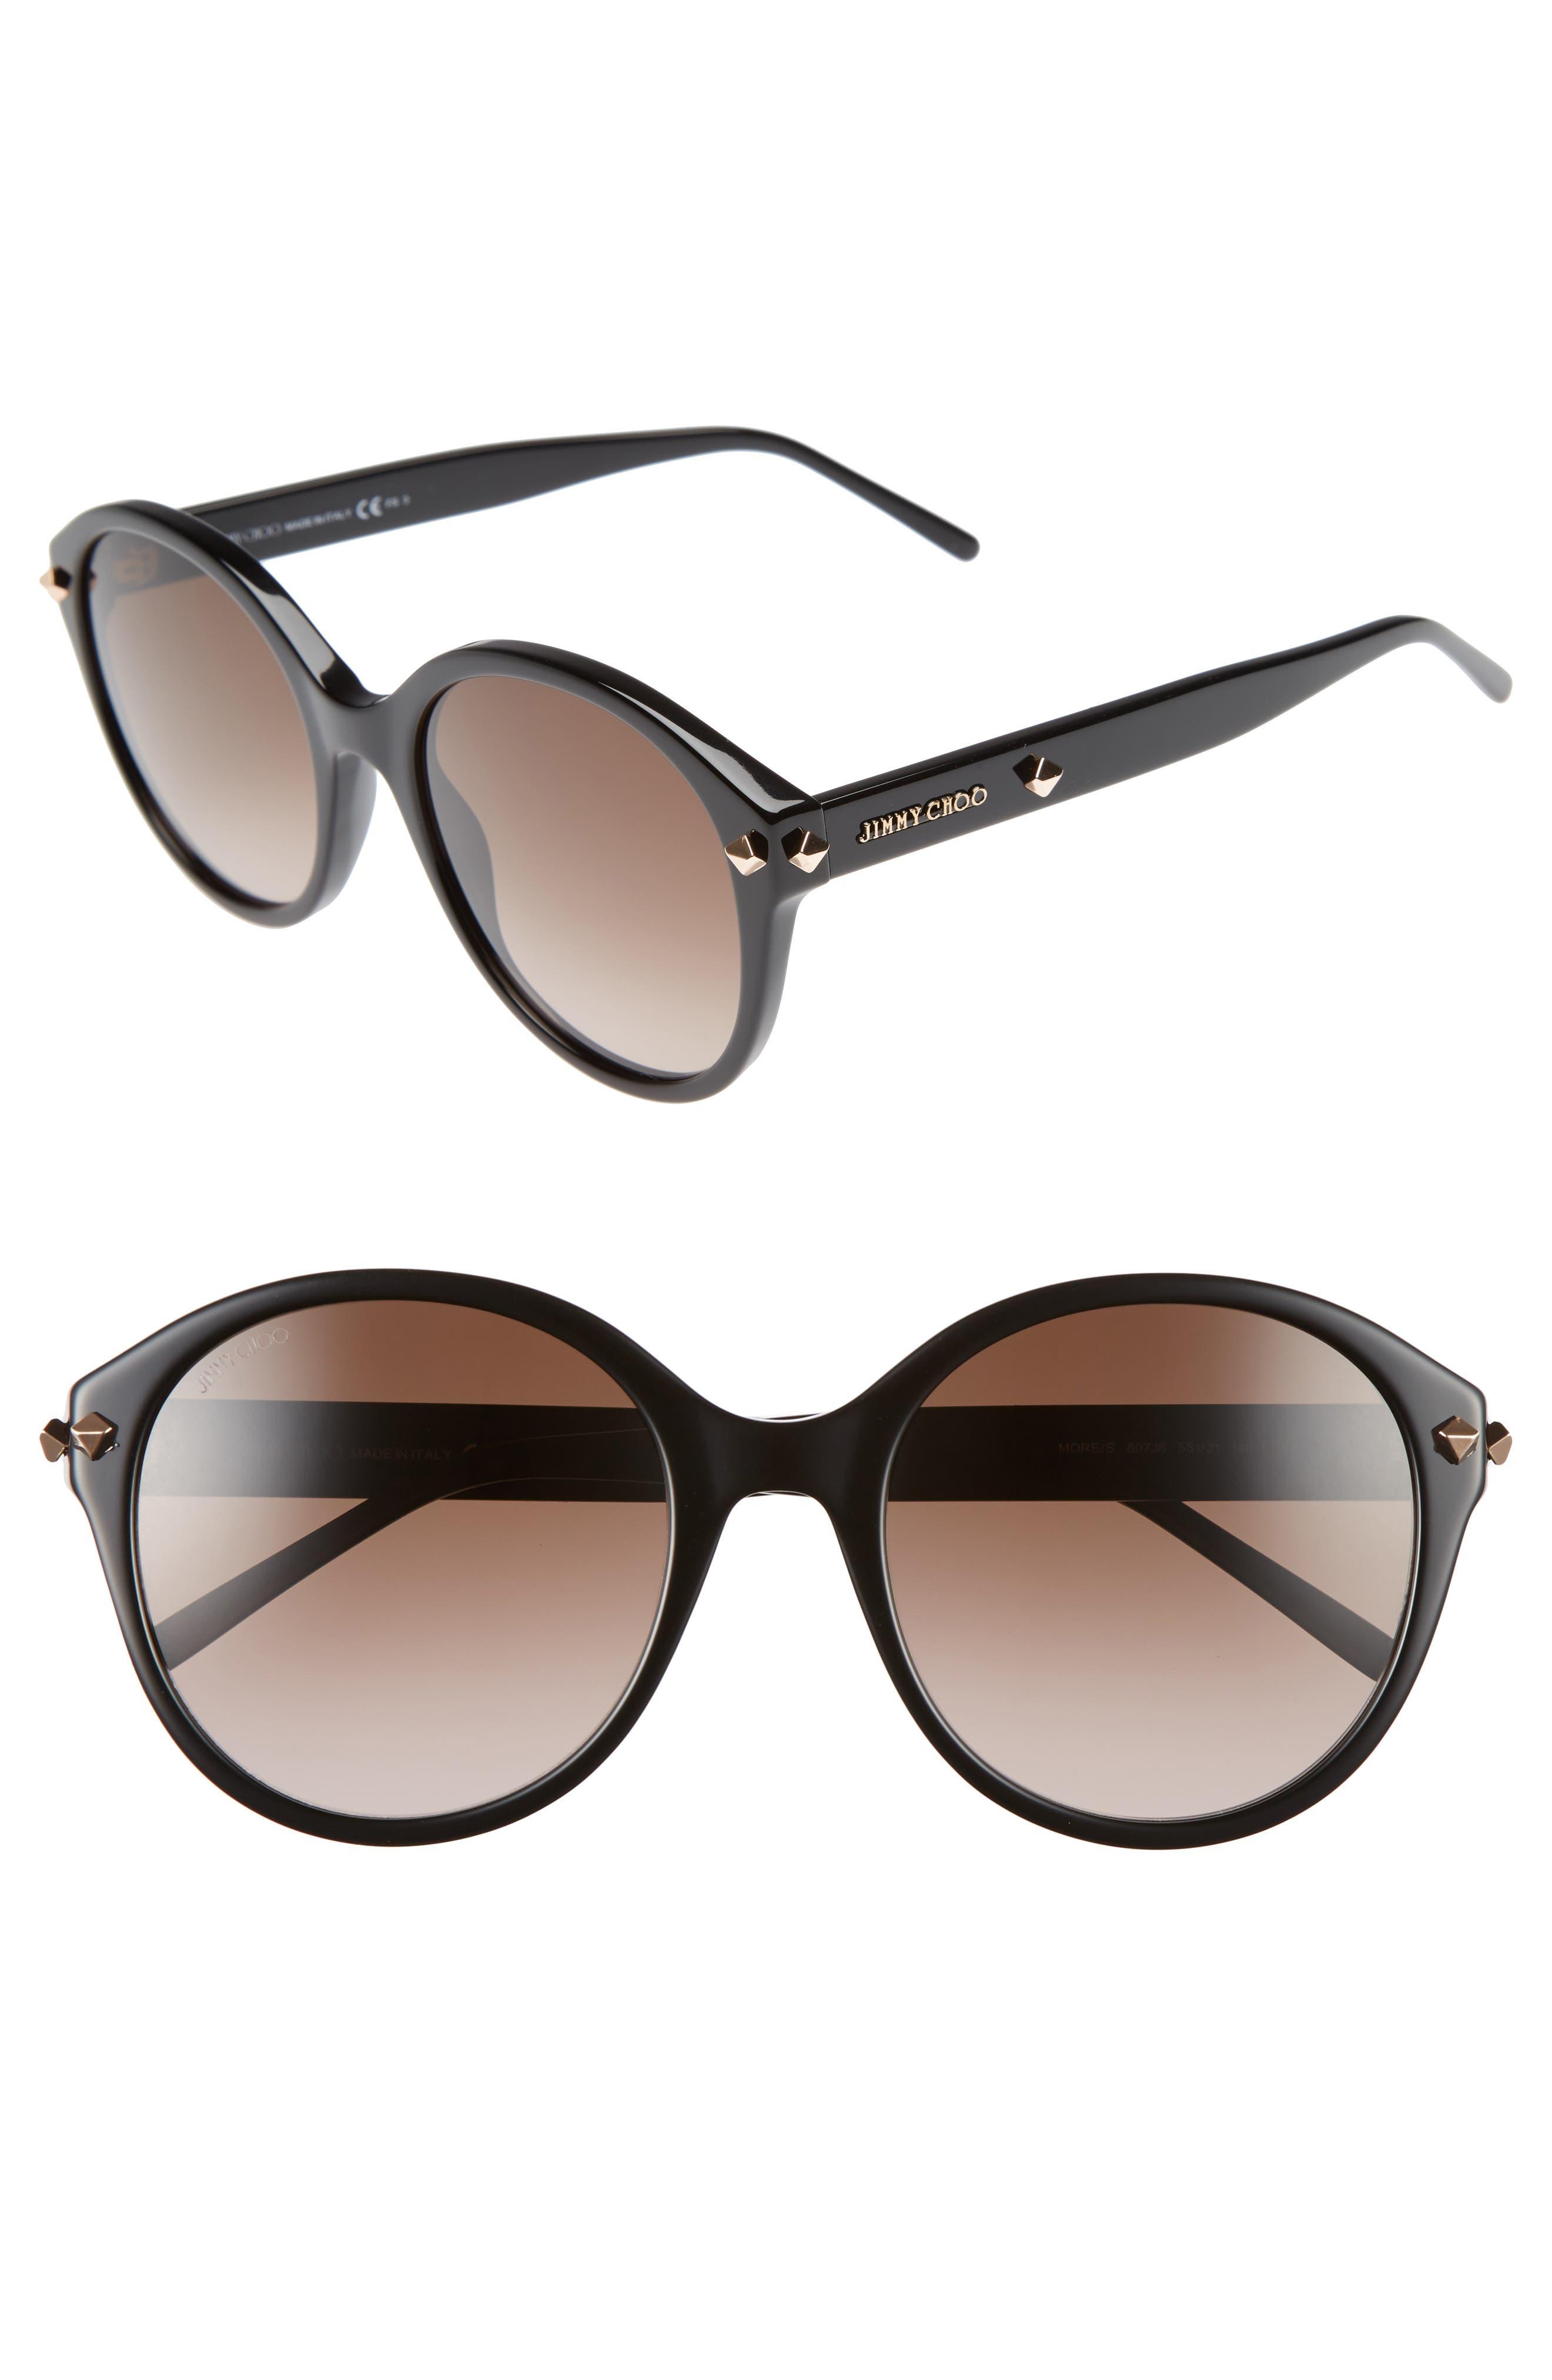 Alternate Image 1 Selected - Jimmy Choo 55mm Oversized Sunglasses